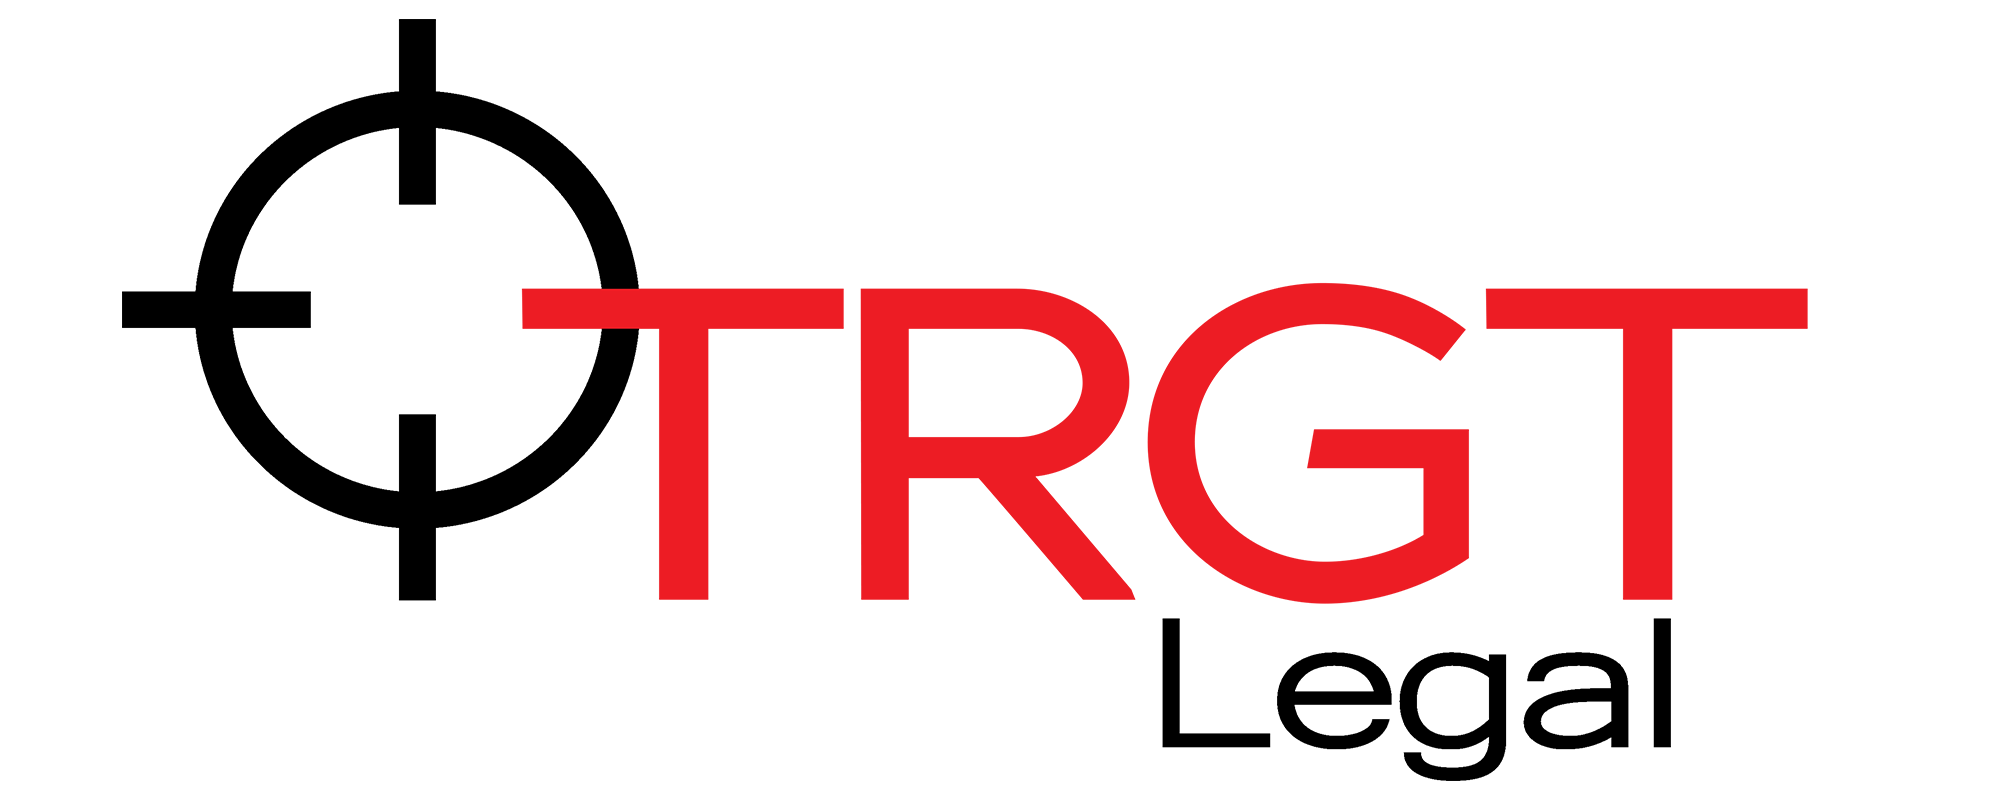 TRGT legal logo